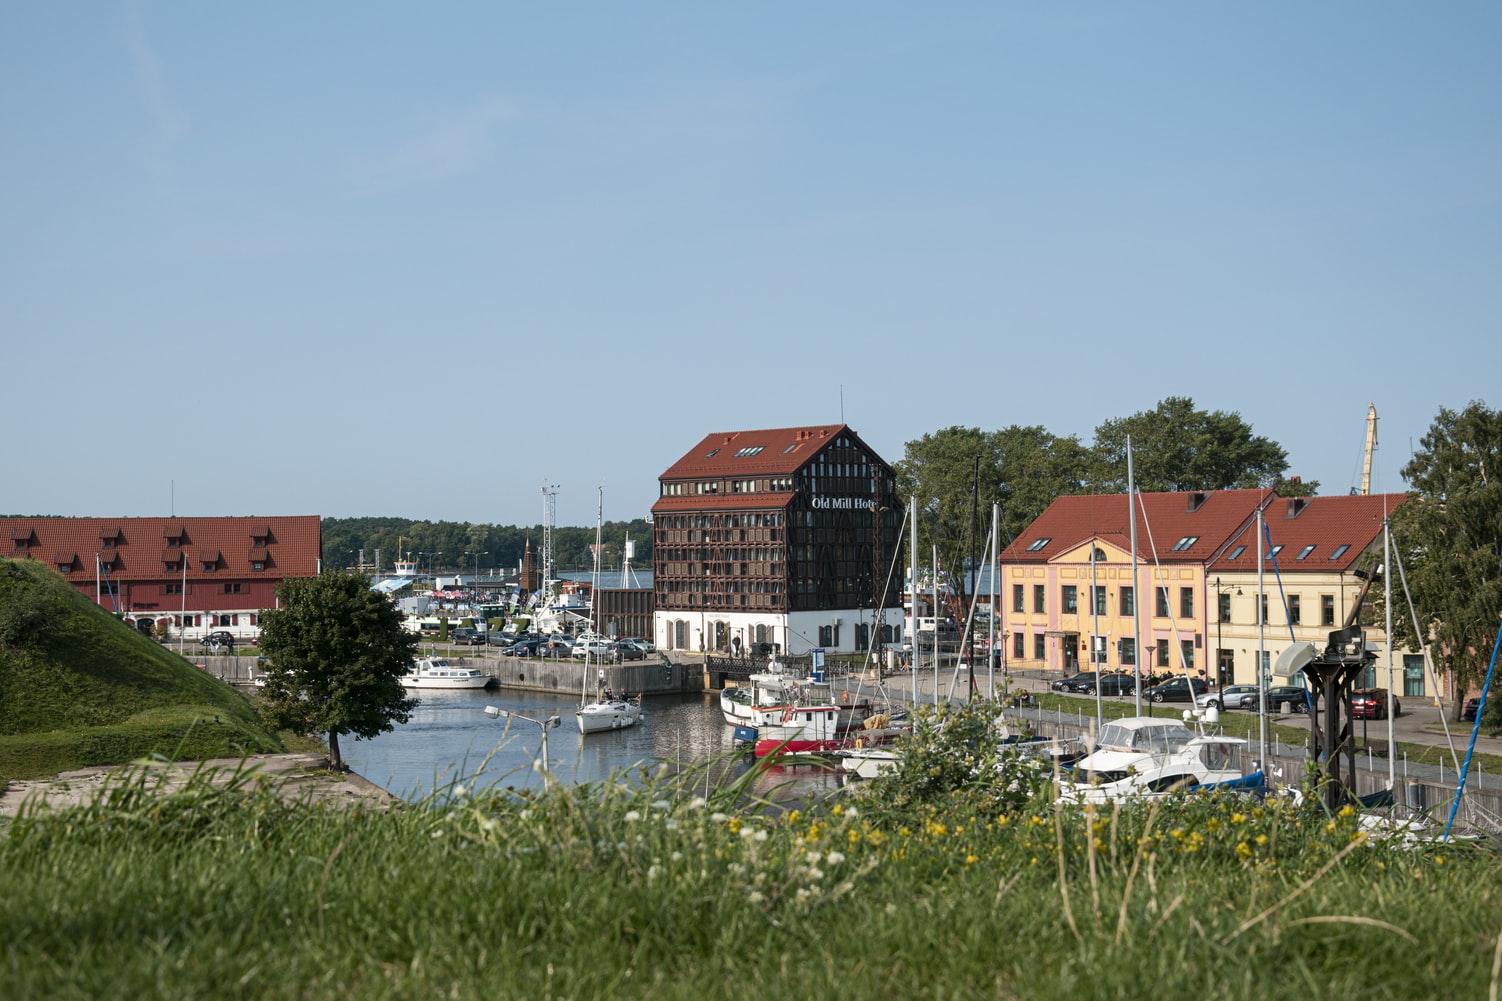 Auslandspraktikum in Litauen - Klaipeda